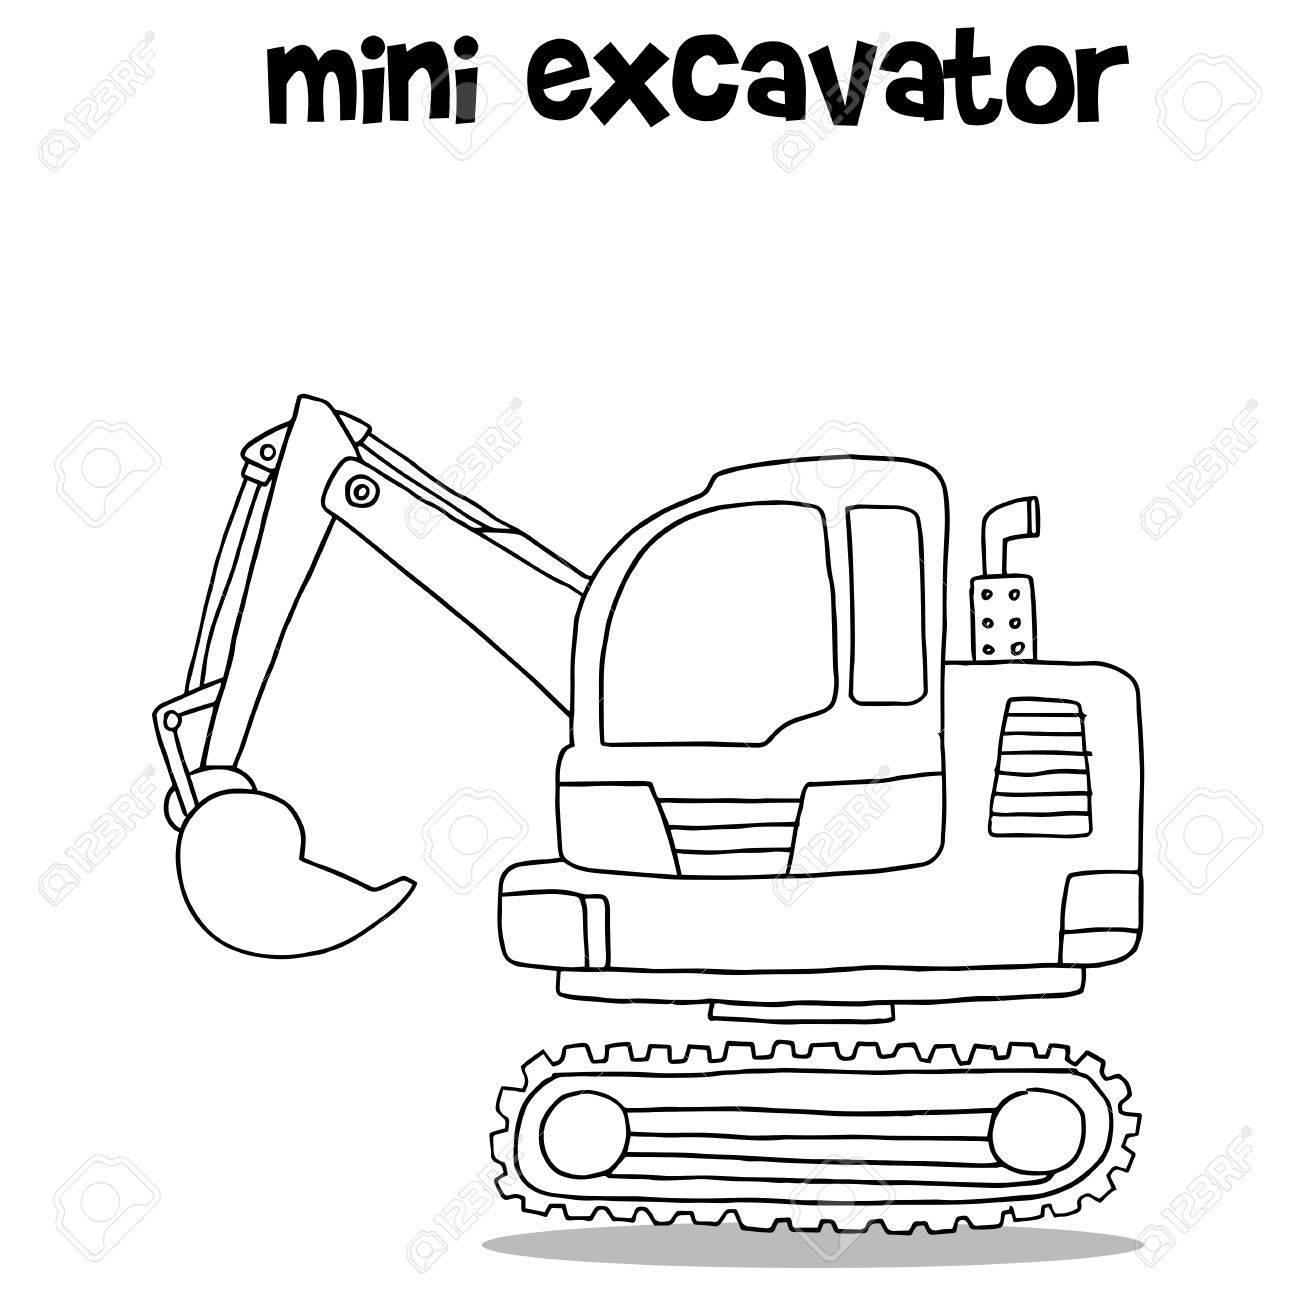 Hand Draw Of Mini Excavator Royalty Free Cliparts, Vectors